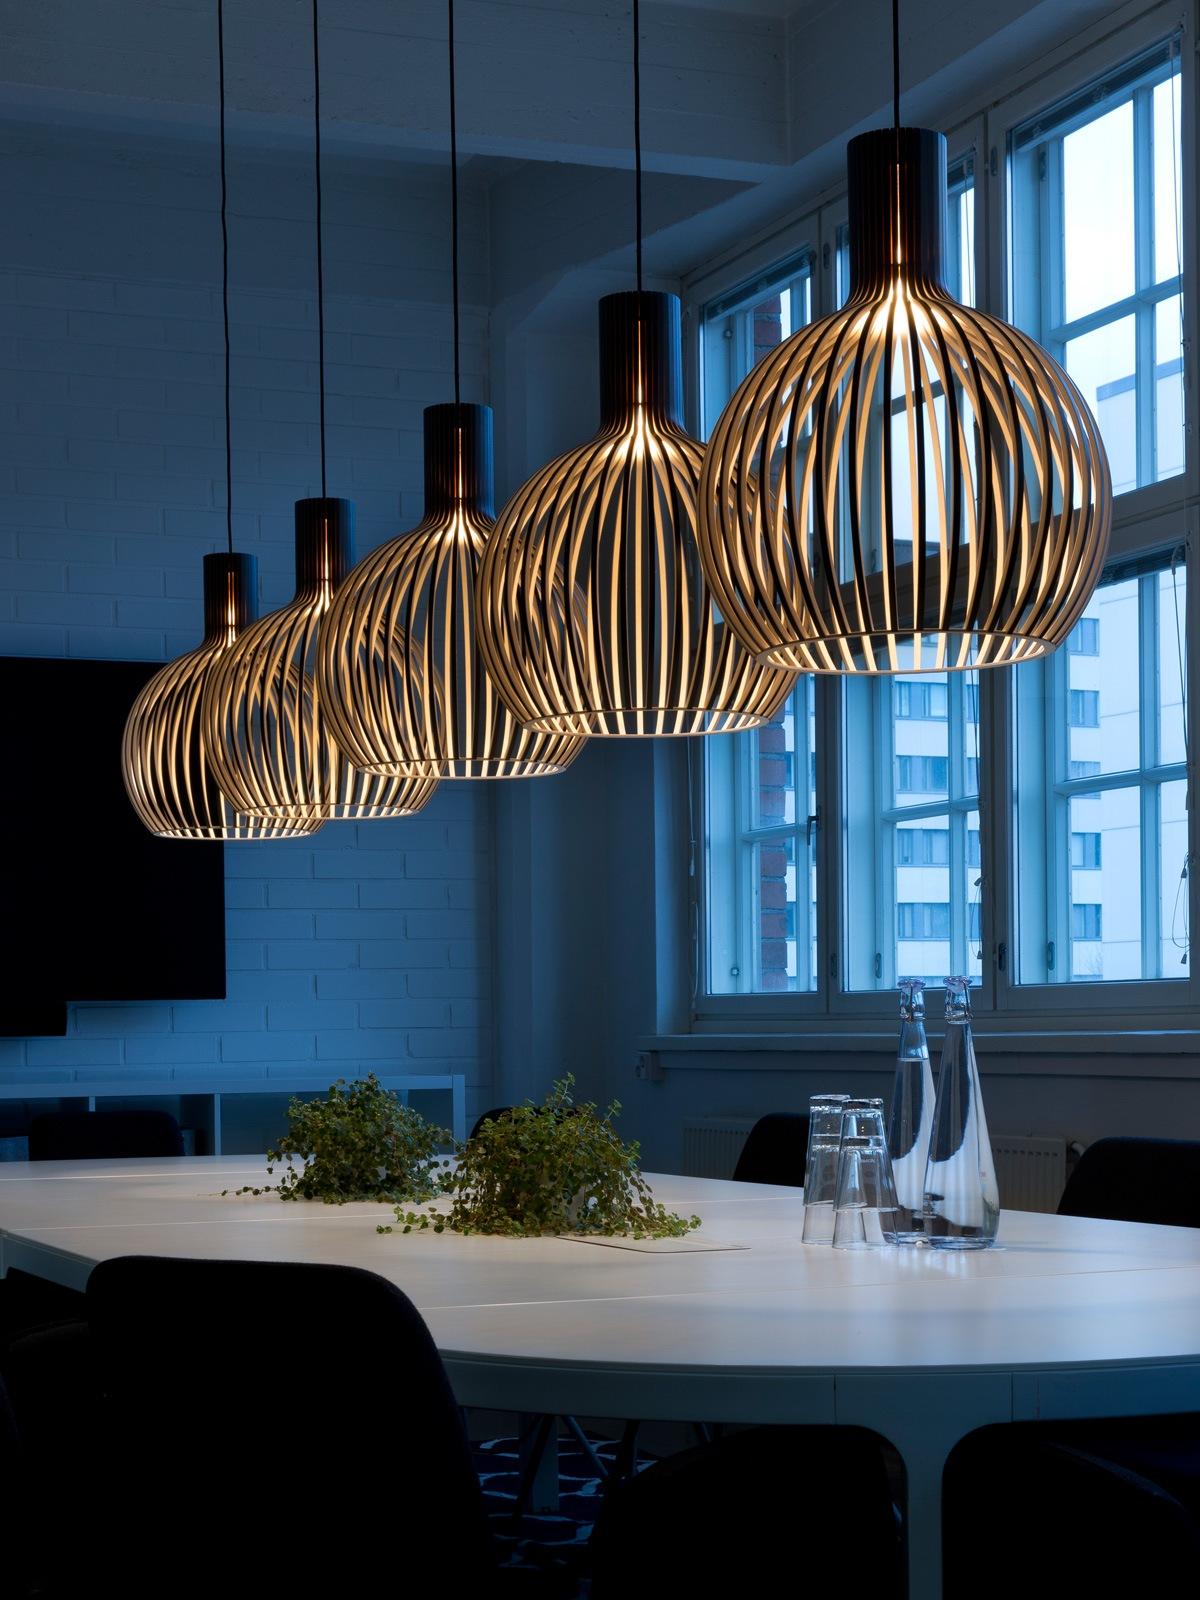 DesignOrt Blog: Octo 4241 small Secto Design skandinavische Holzleuchte DesignOrt Lampen Berlin Onlineshop